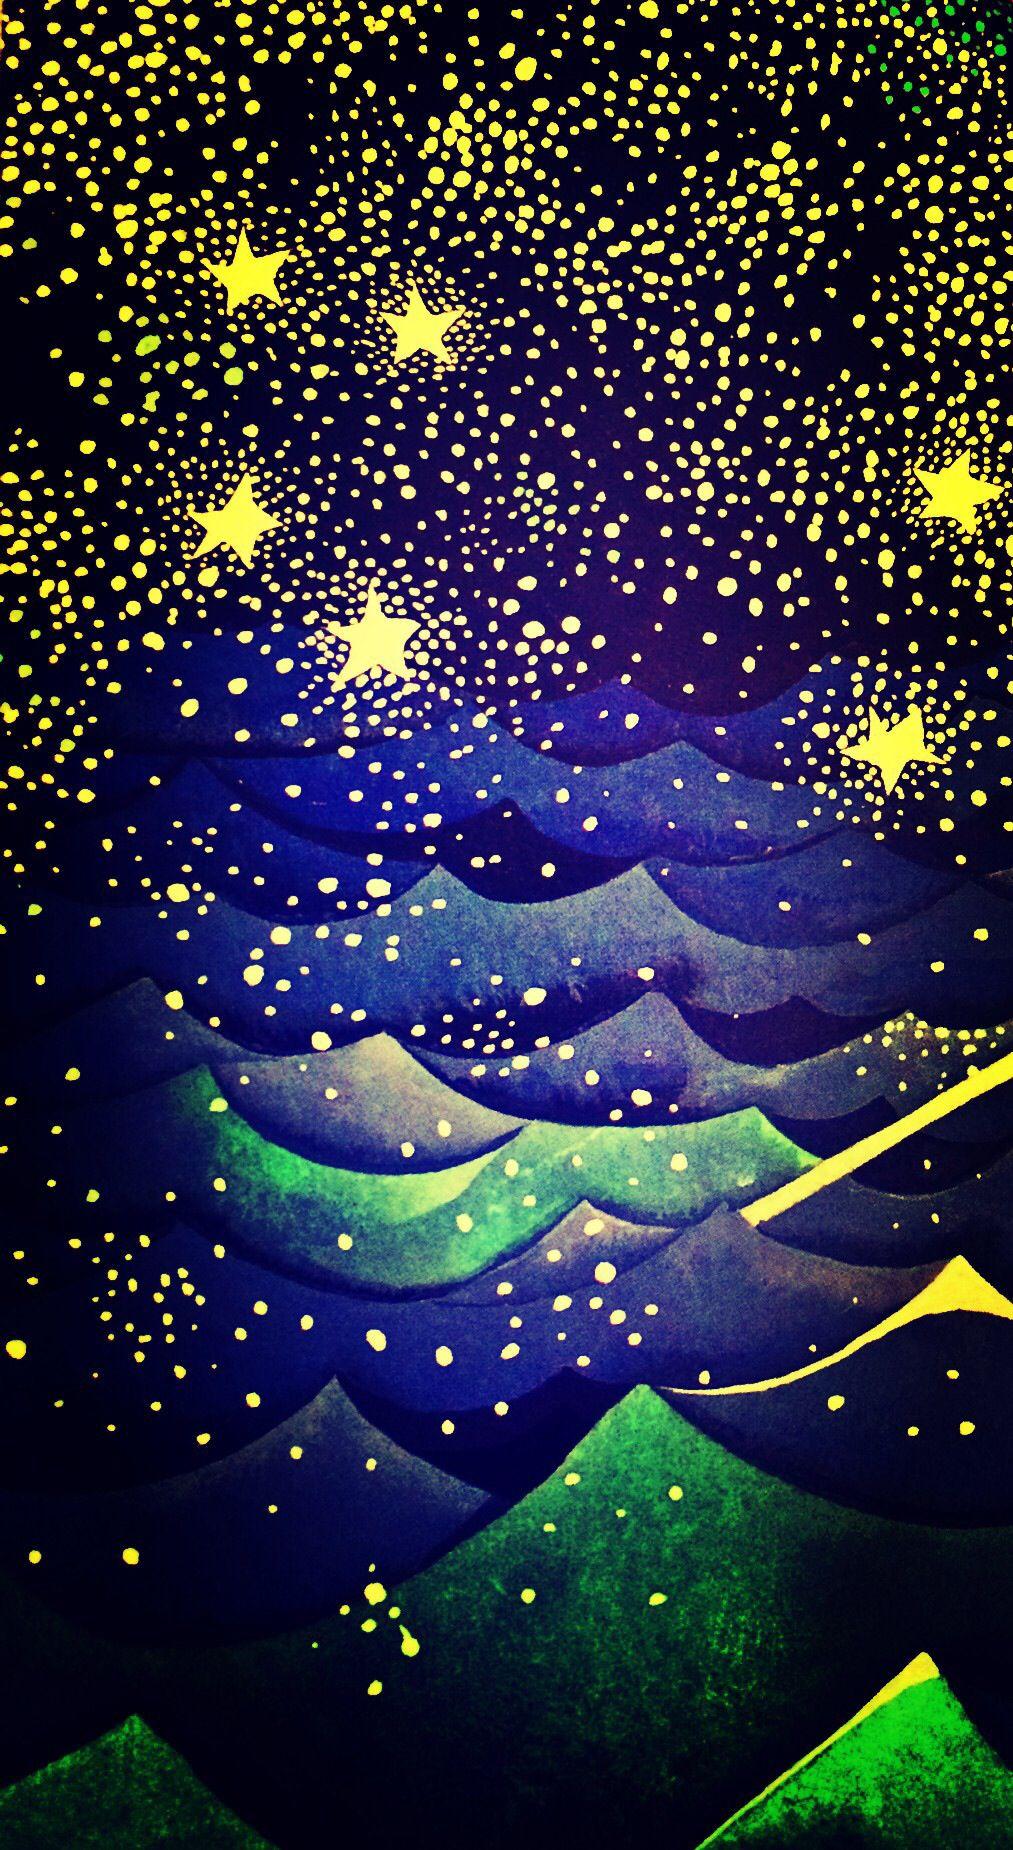 рисунки звездное небо один